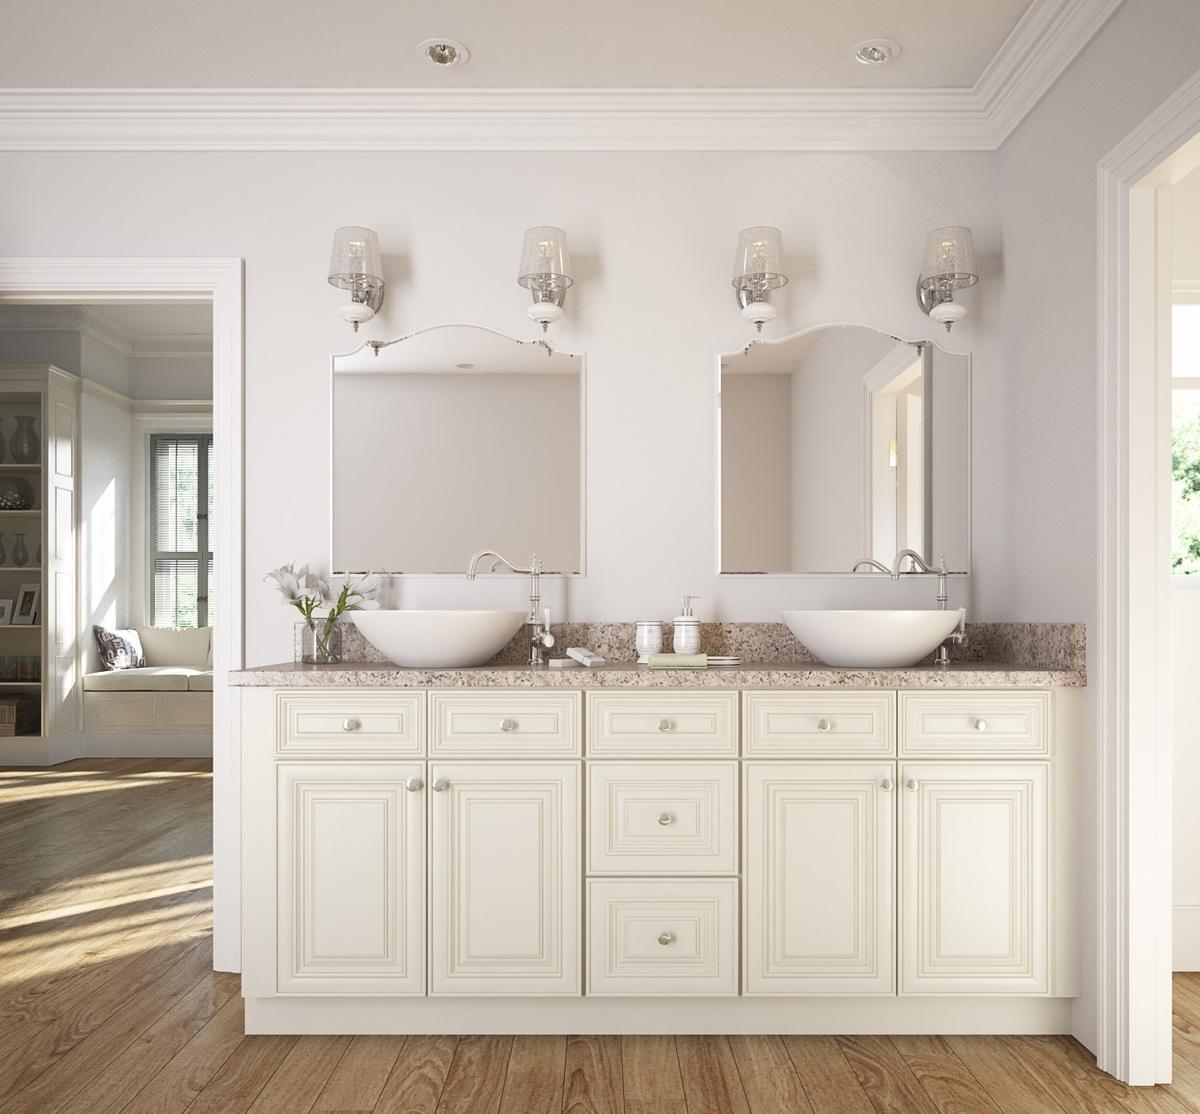 Cambridge Antique White Glaze Ready To Assemble Bathroom